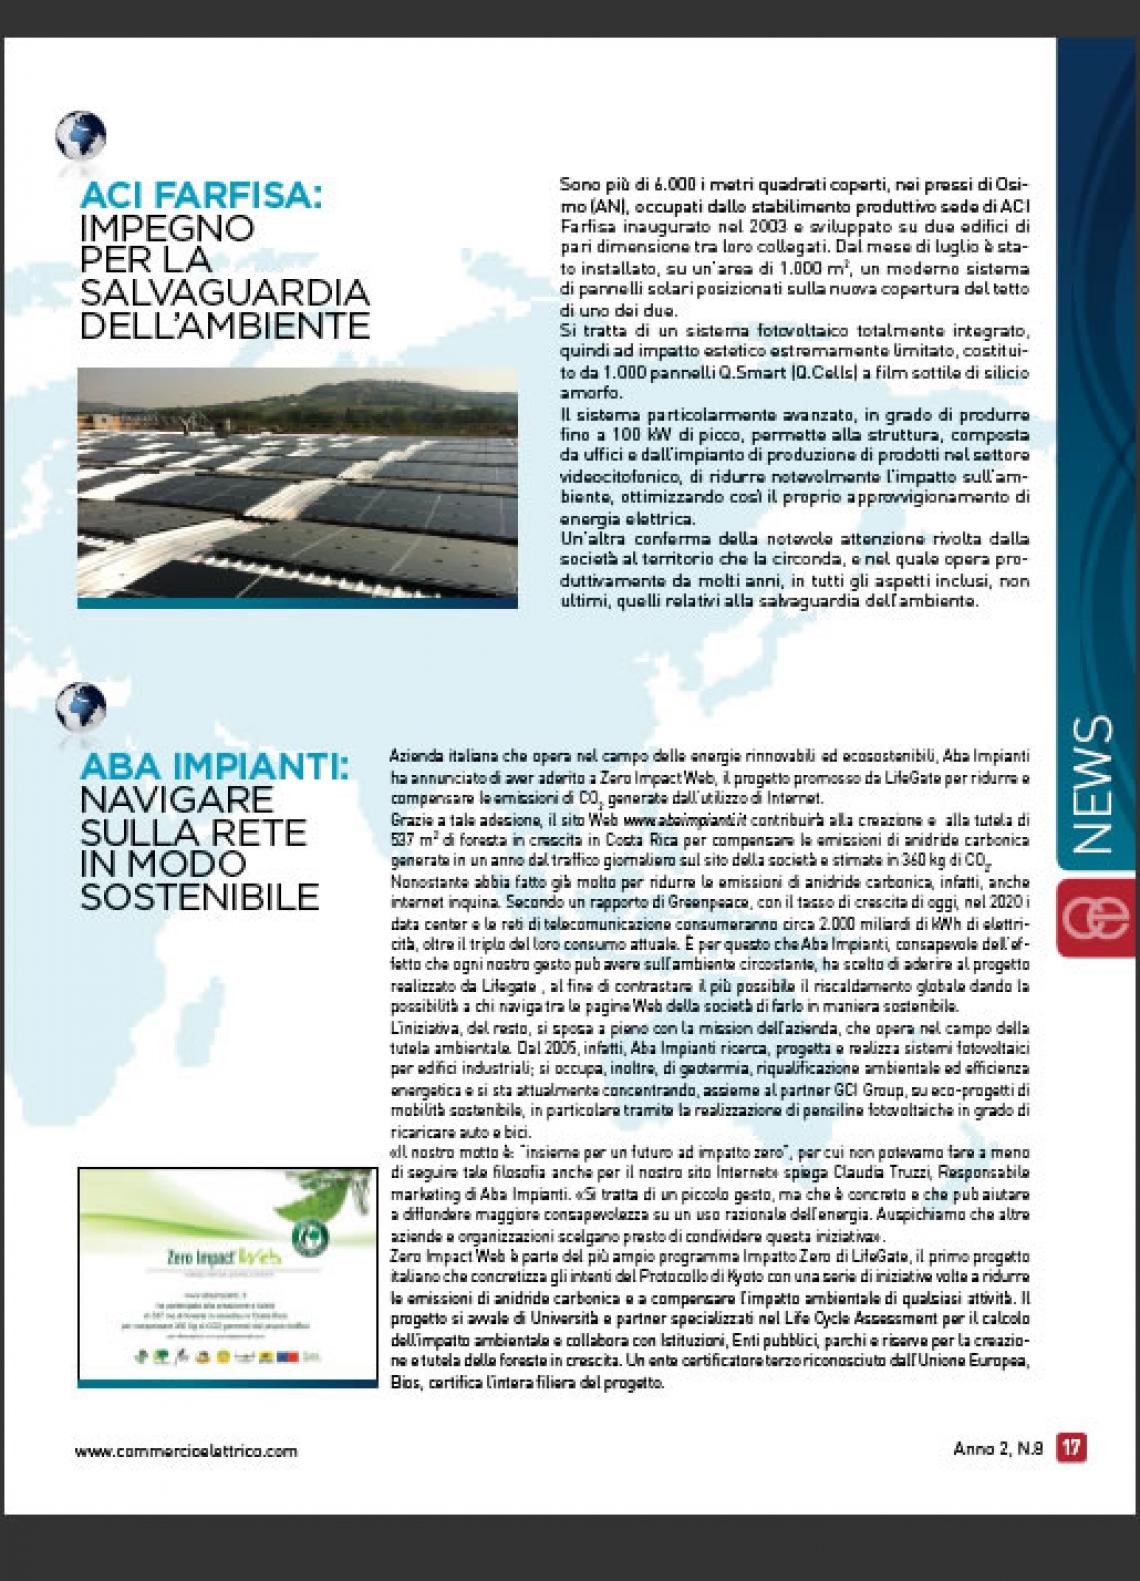 Salvaguardia per l'ambiente per Aci Farfisa